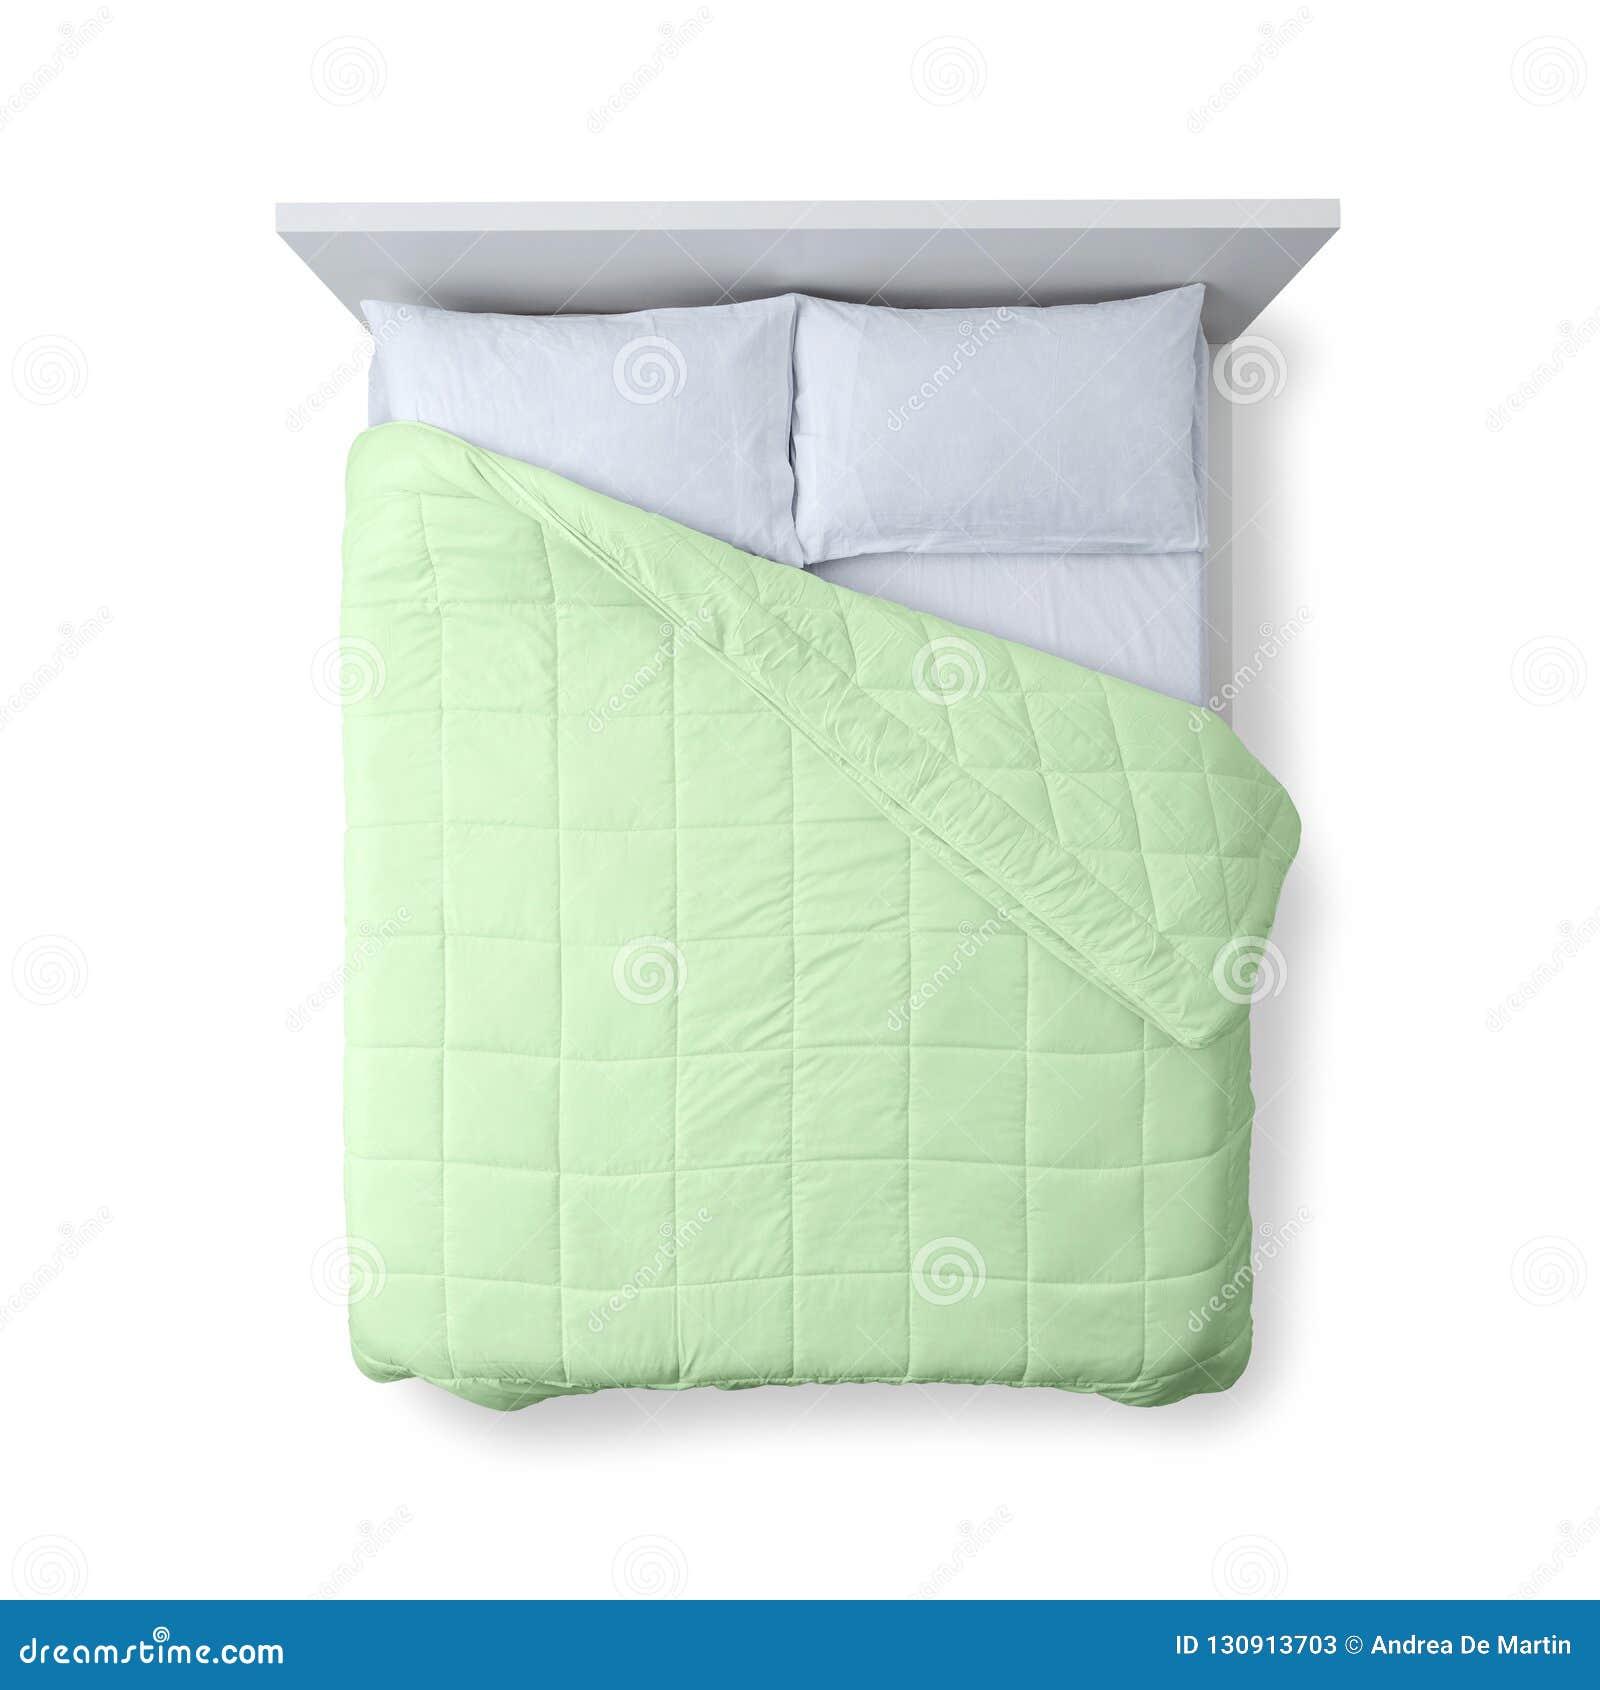 Elegant Bed Top View Stock Image. Image Of Furniture